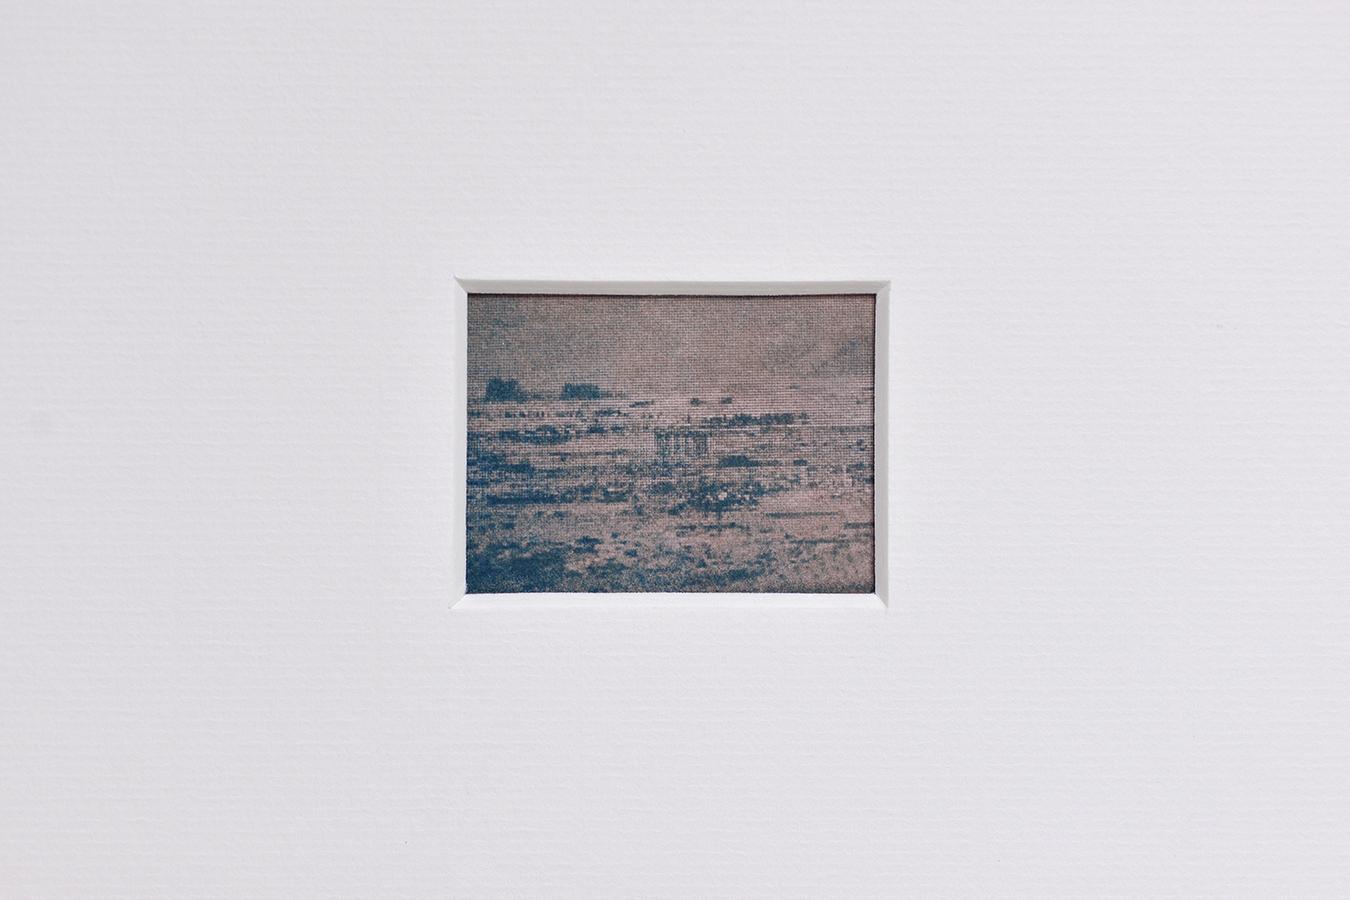 Tadmer 08, 2020⎥cyanotype viré⎥4 x 5,5 cm ⎥220 €